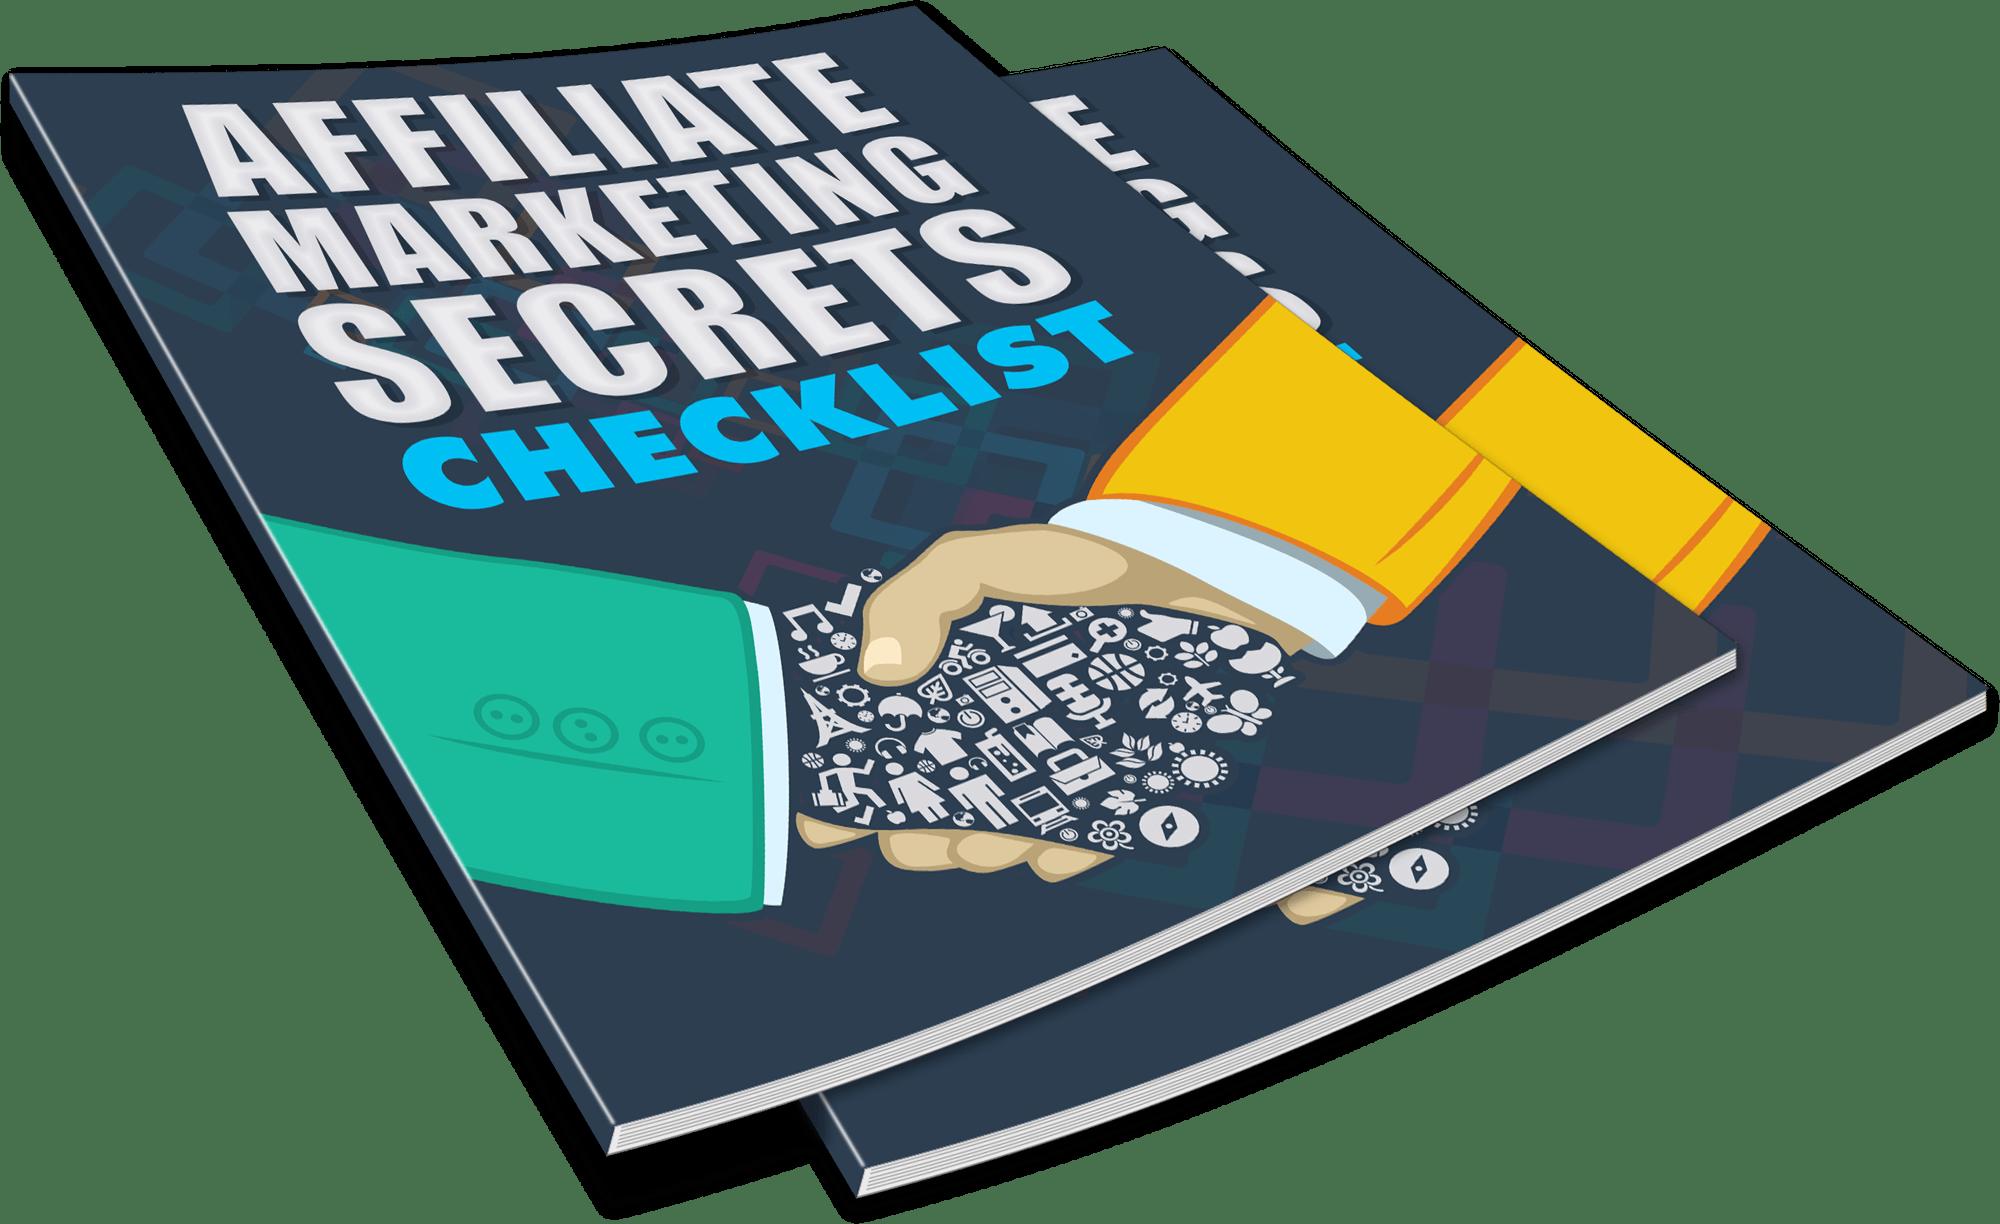 AMS M7 ChecklistMagazine 1 - Powerful Affiliate Marketing Secrets I Wish I Knew Then...